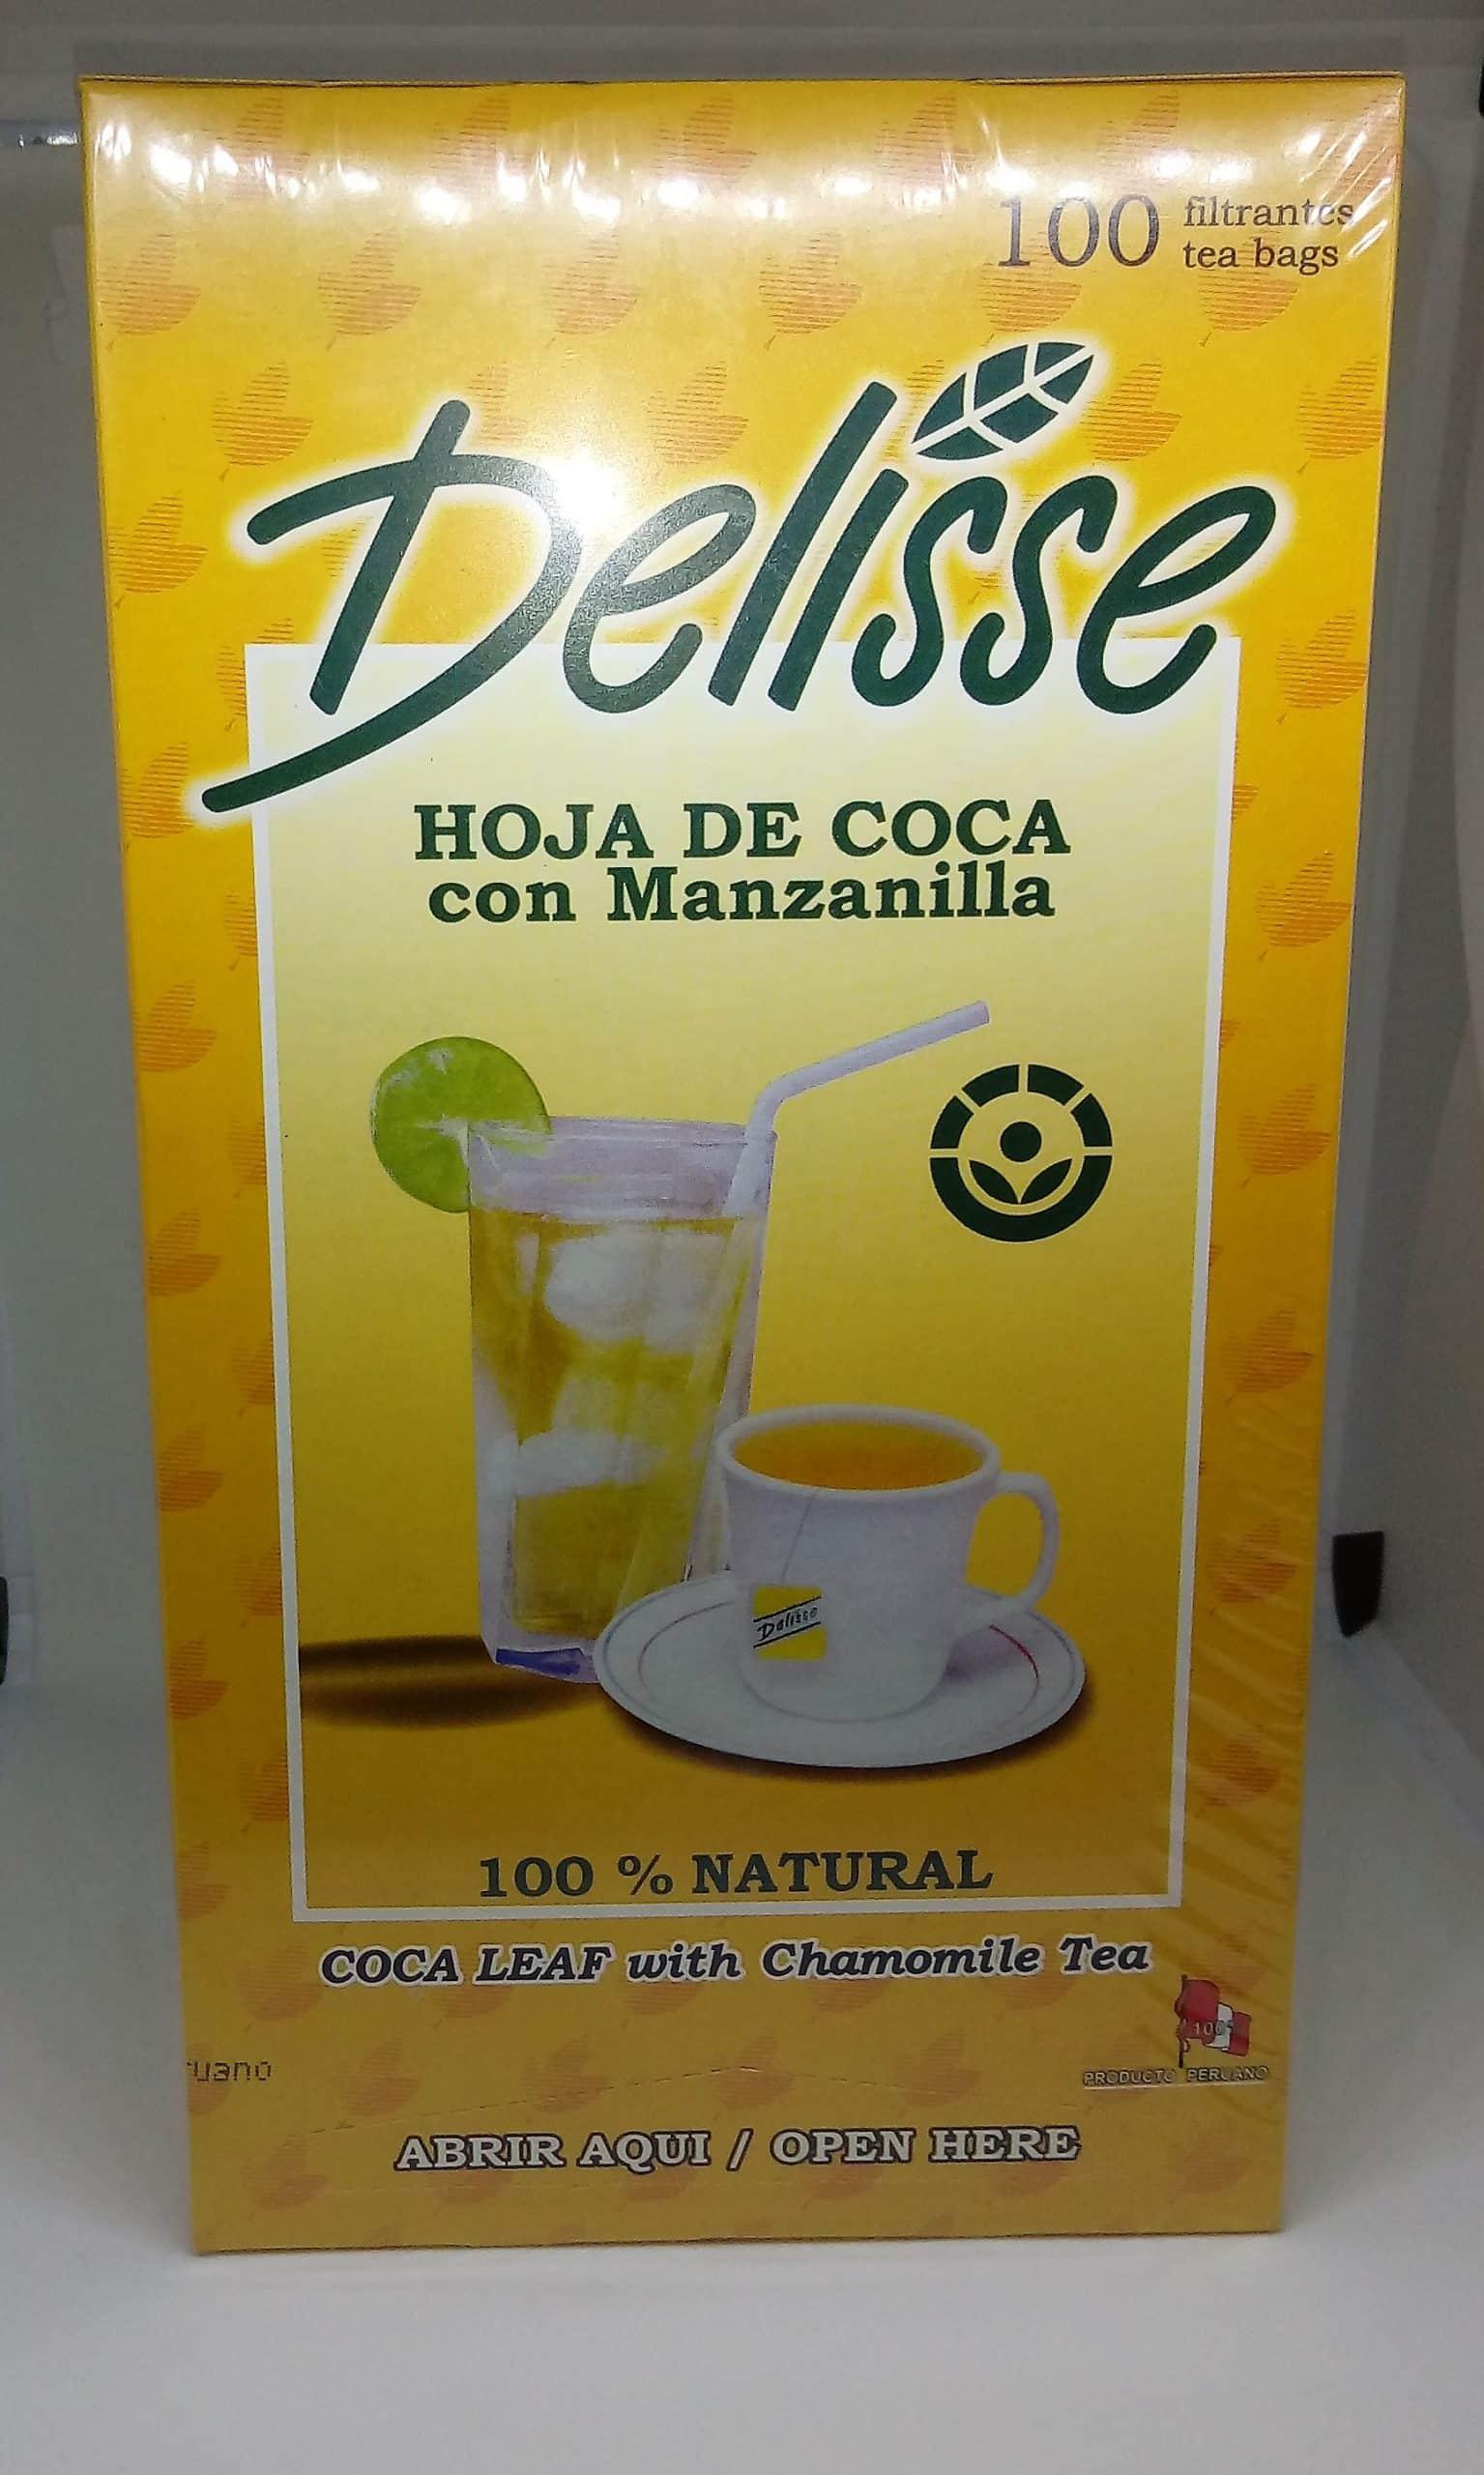 100 bags Peru thee Mate de coca thea